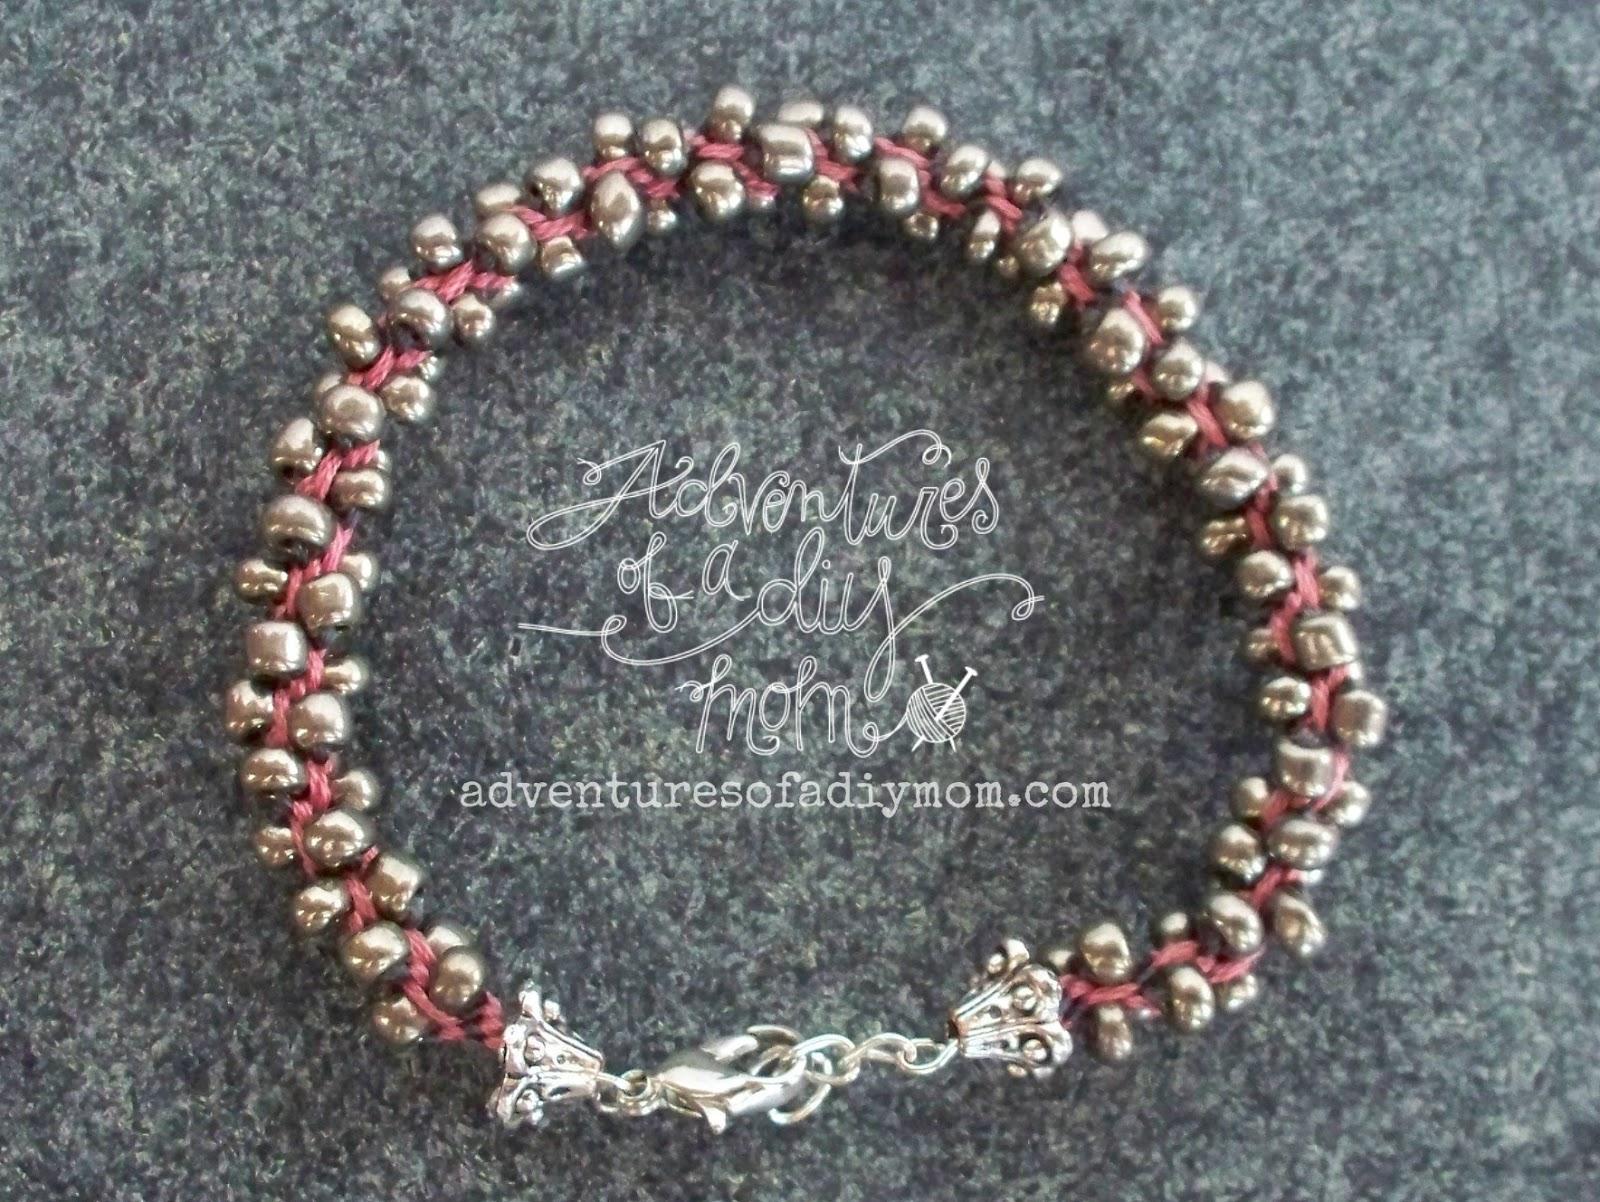 Embroidery thread and seed bead kumihimo bracelets a